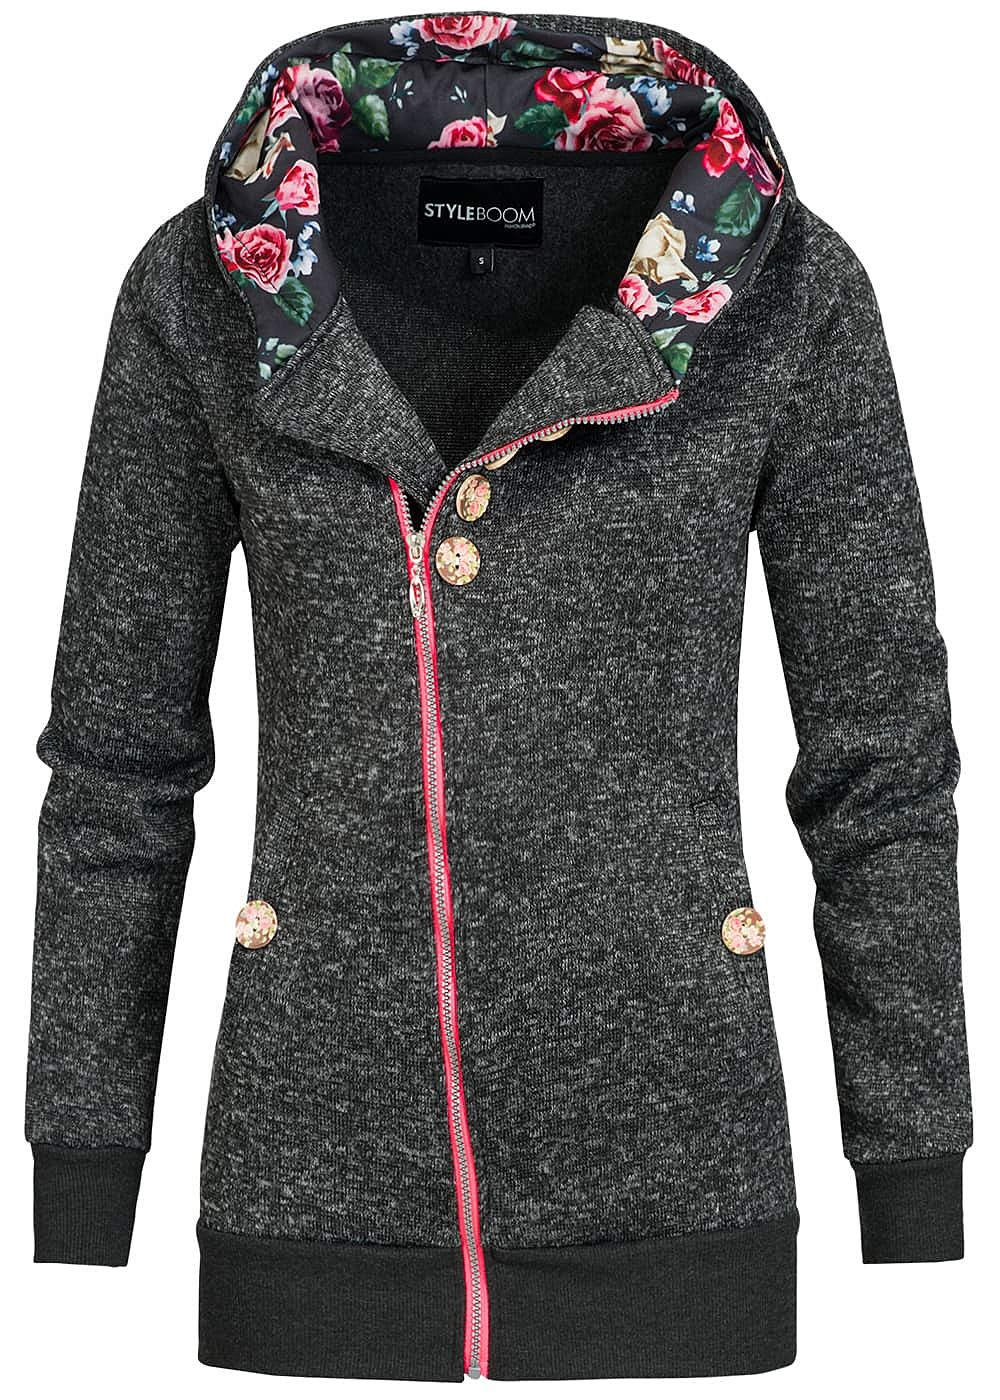 styleboom fashion damen zip hoodie asymmetrischer zipper kapuze dunkel grau melange 77onlineshop. Black Bedroom Furniture Sets. Home Design Ideas